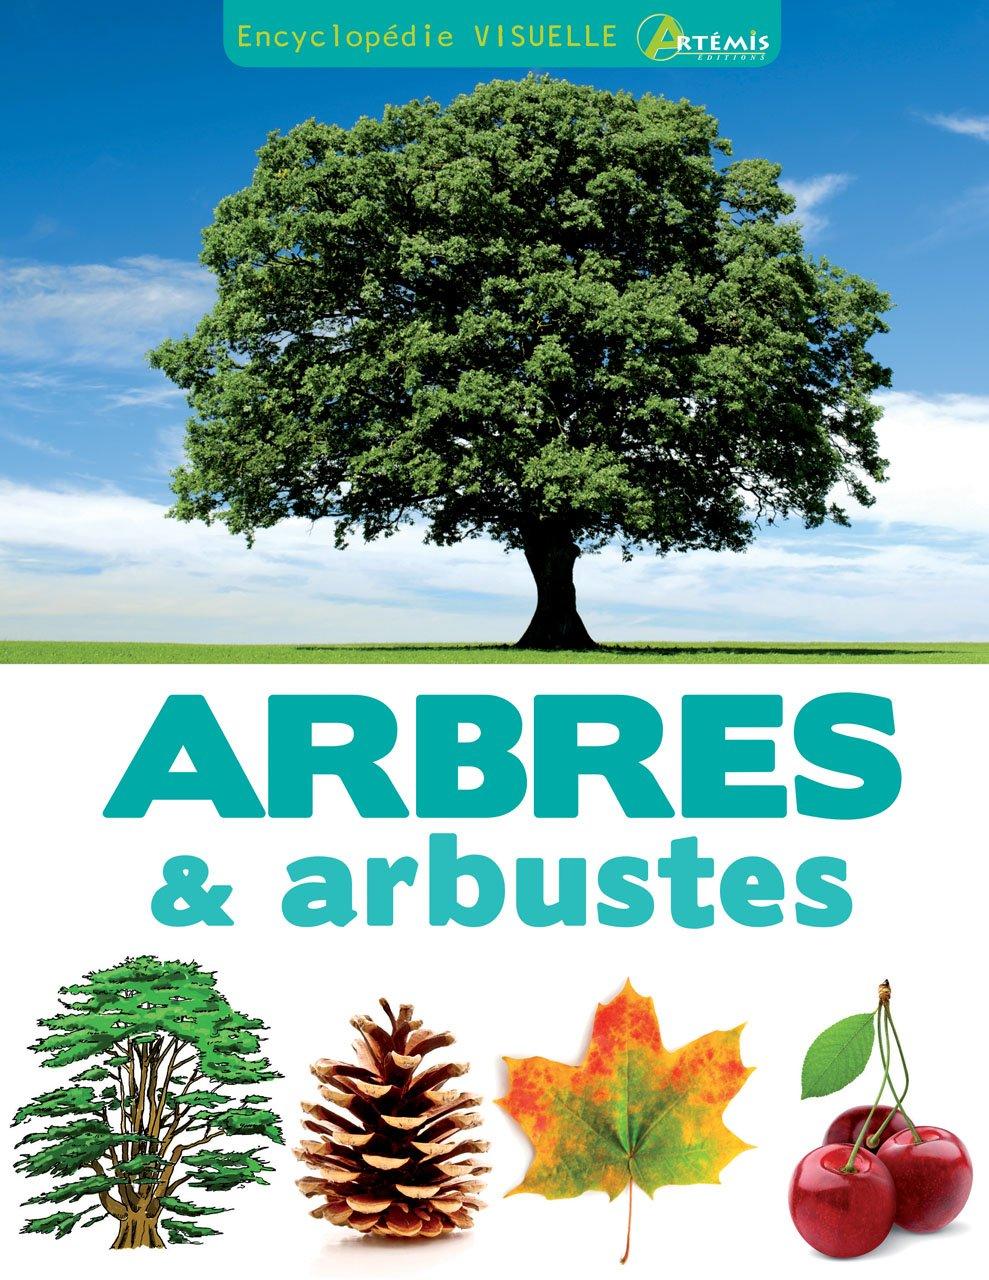 Encyclopédie visuelle des arbres & arbustes sur Bookys